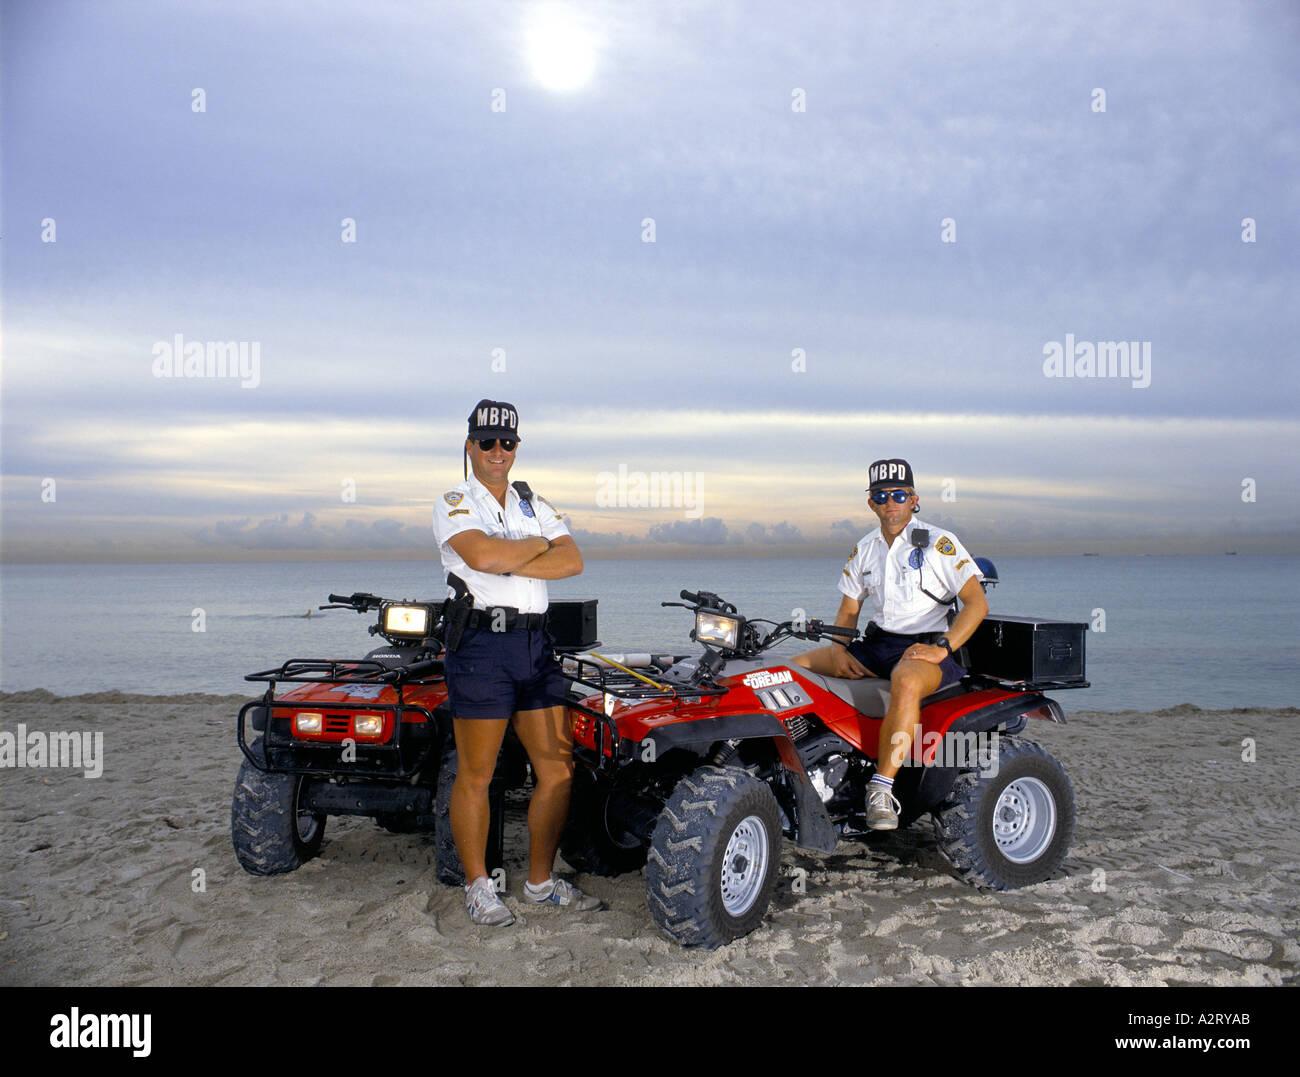 Police Miami Beach